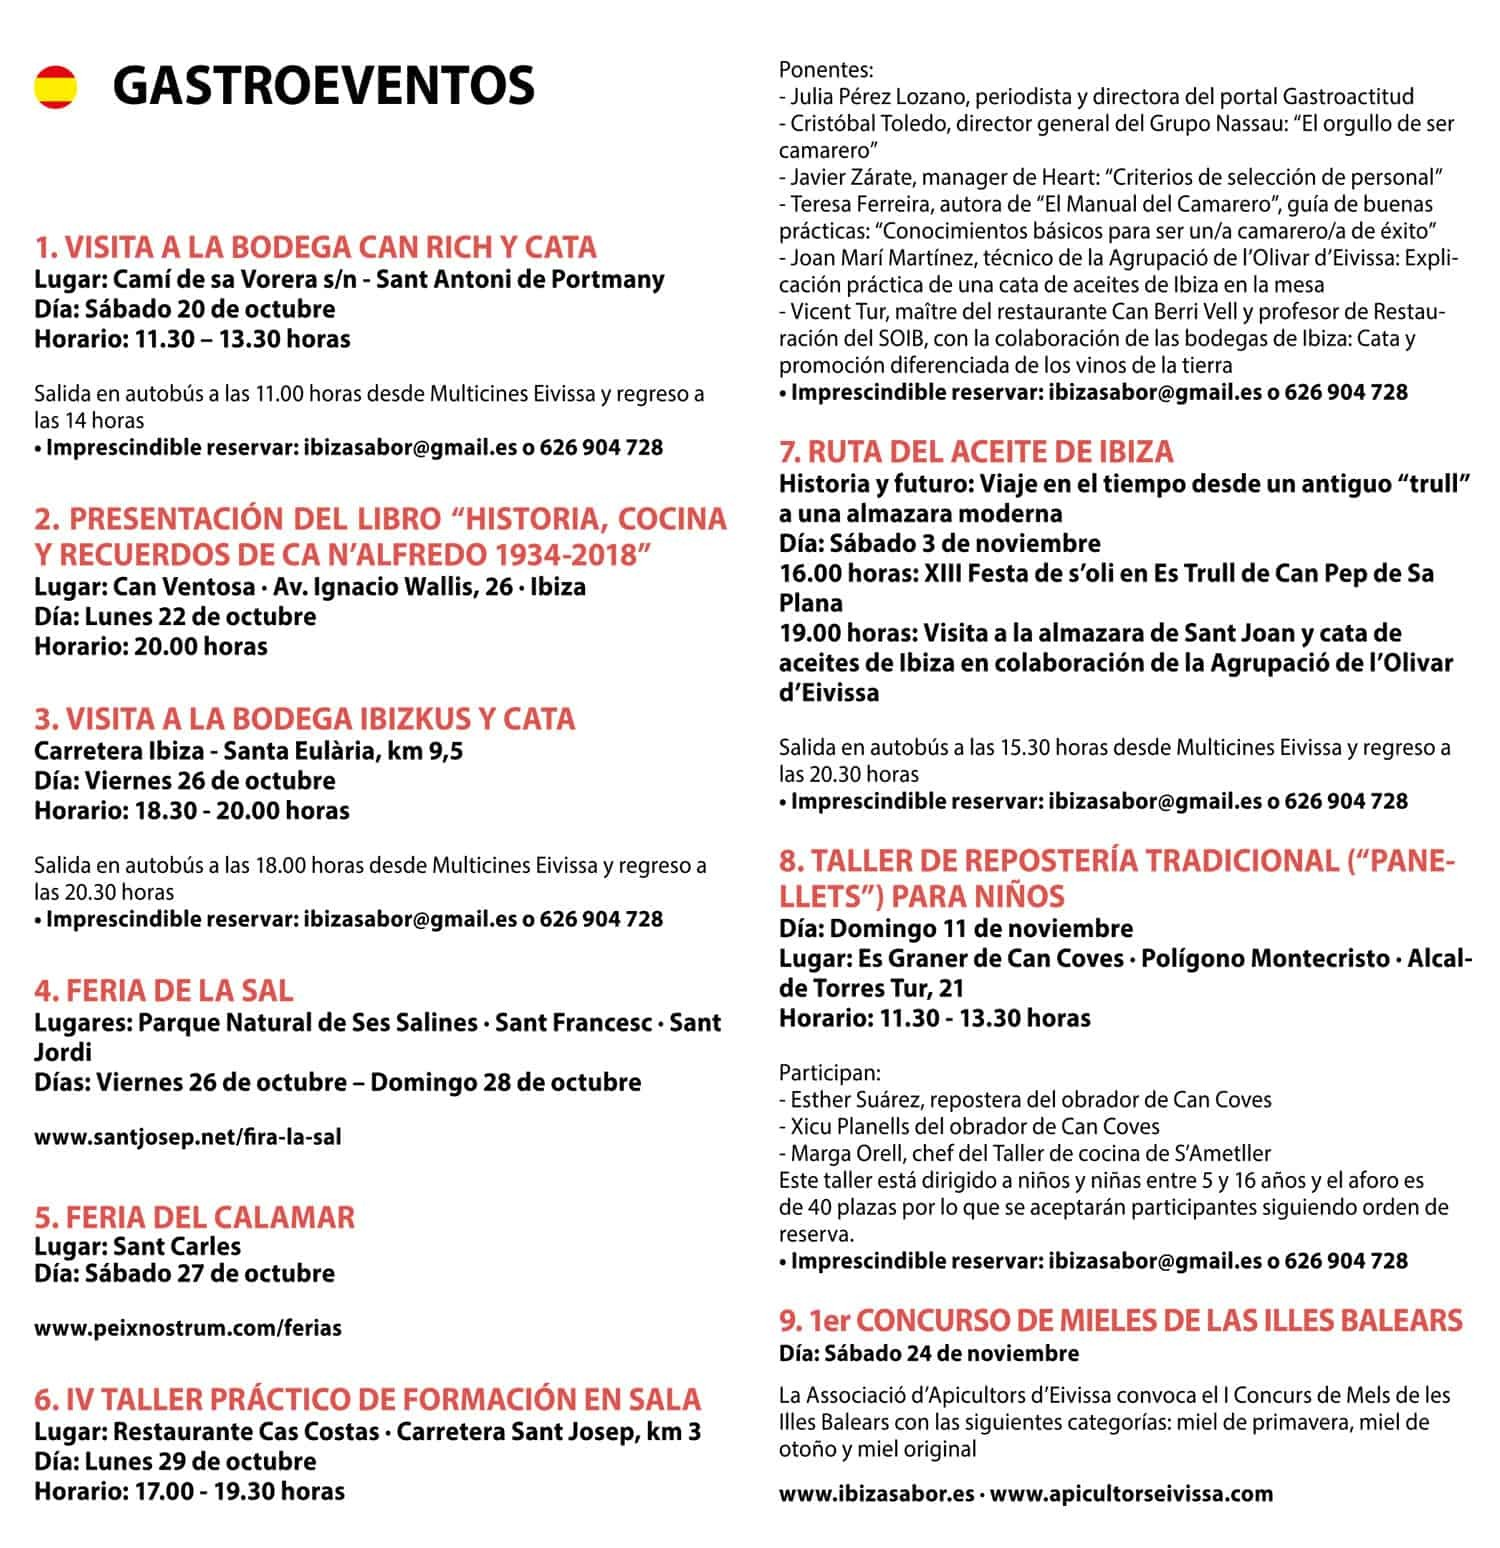 Calendario 2019 Festivos Baleares Más Recientemente Liberado Planes En Ibiza Jornadas Gastron³micas Ibiza Sabor Oto±o 2018 Of Calendario 2019 Festivos Baleares Actual Fiestas Ibiza 2017 Hyte En Amnesia Ibiza Cada Miércoles